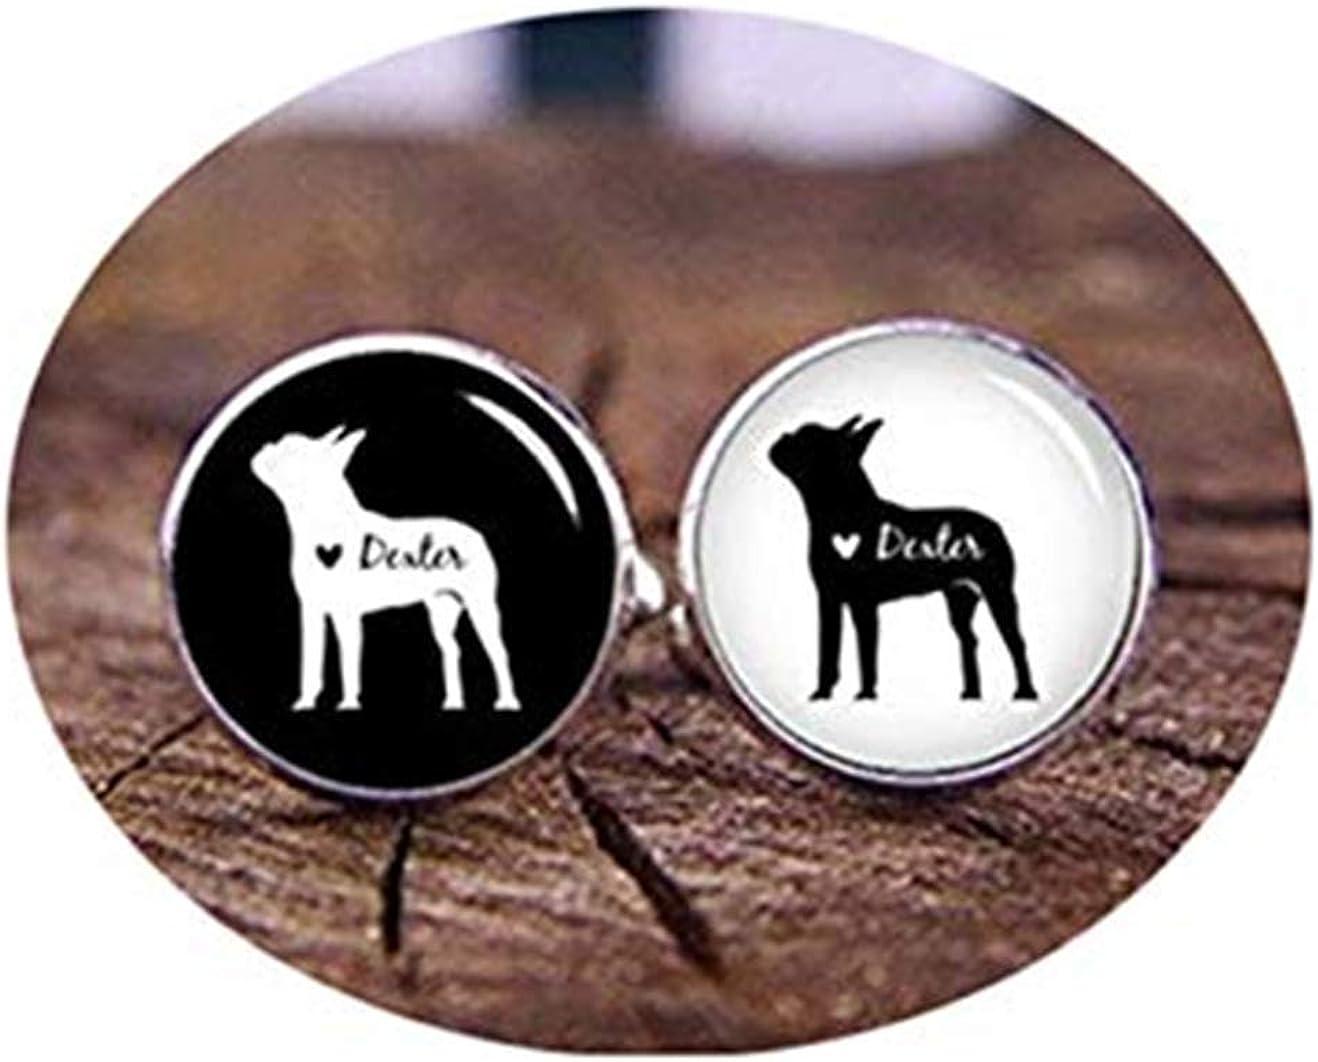 Death Devil Art Picture Cuff Links,Boston Terrier Cufflinks, Custom Dog Cuff Links, Custom Your Dog's Name, Personalized Cufflinks, Custom Animal Profile, Groom Cufflinks, Dog,Gift of Love